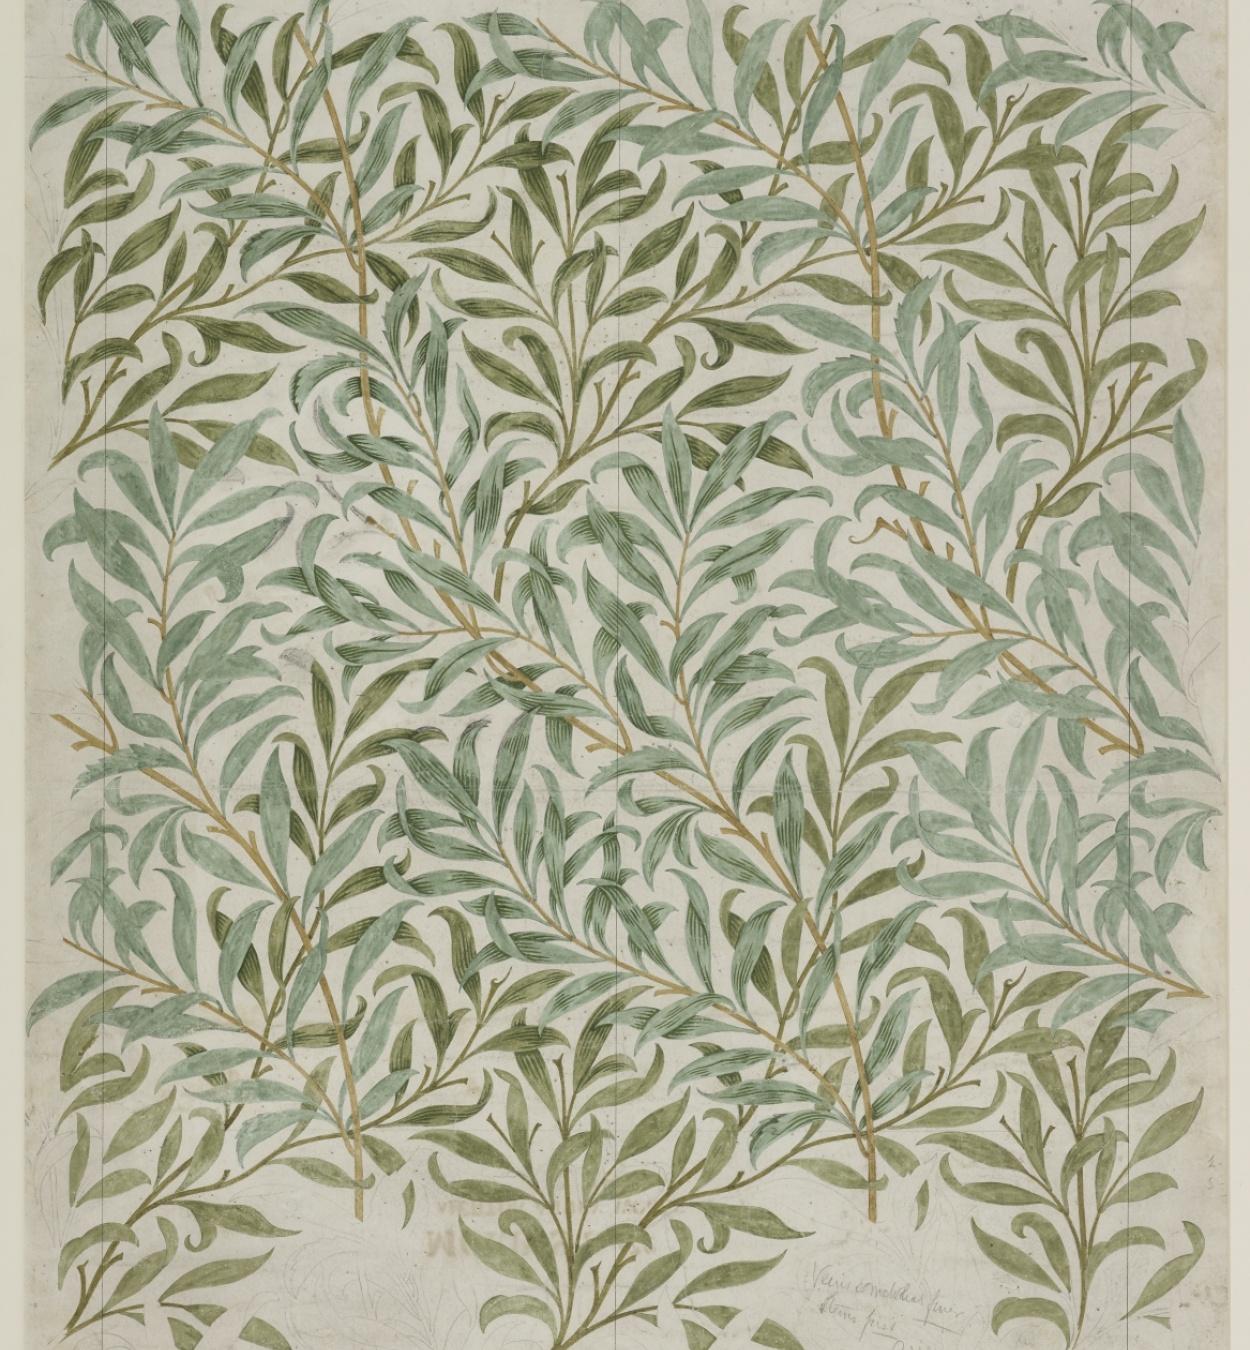 William Morris. Disseny per al paper pintat Willow Bough (branca de salze). 1887 © The Whitworth, The University of Manchester